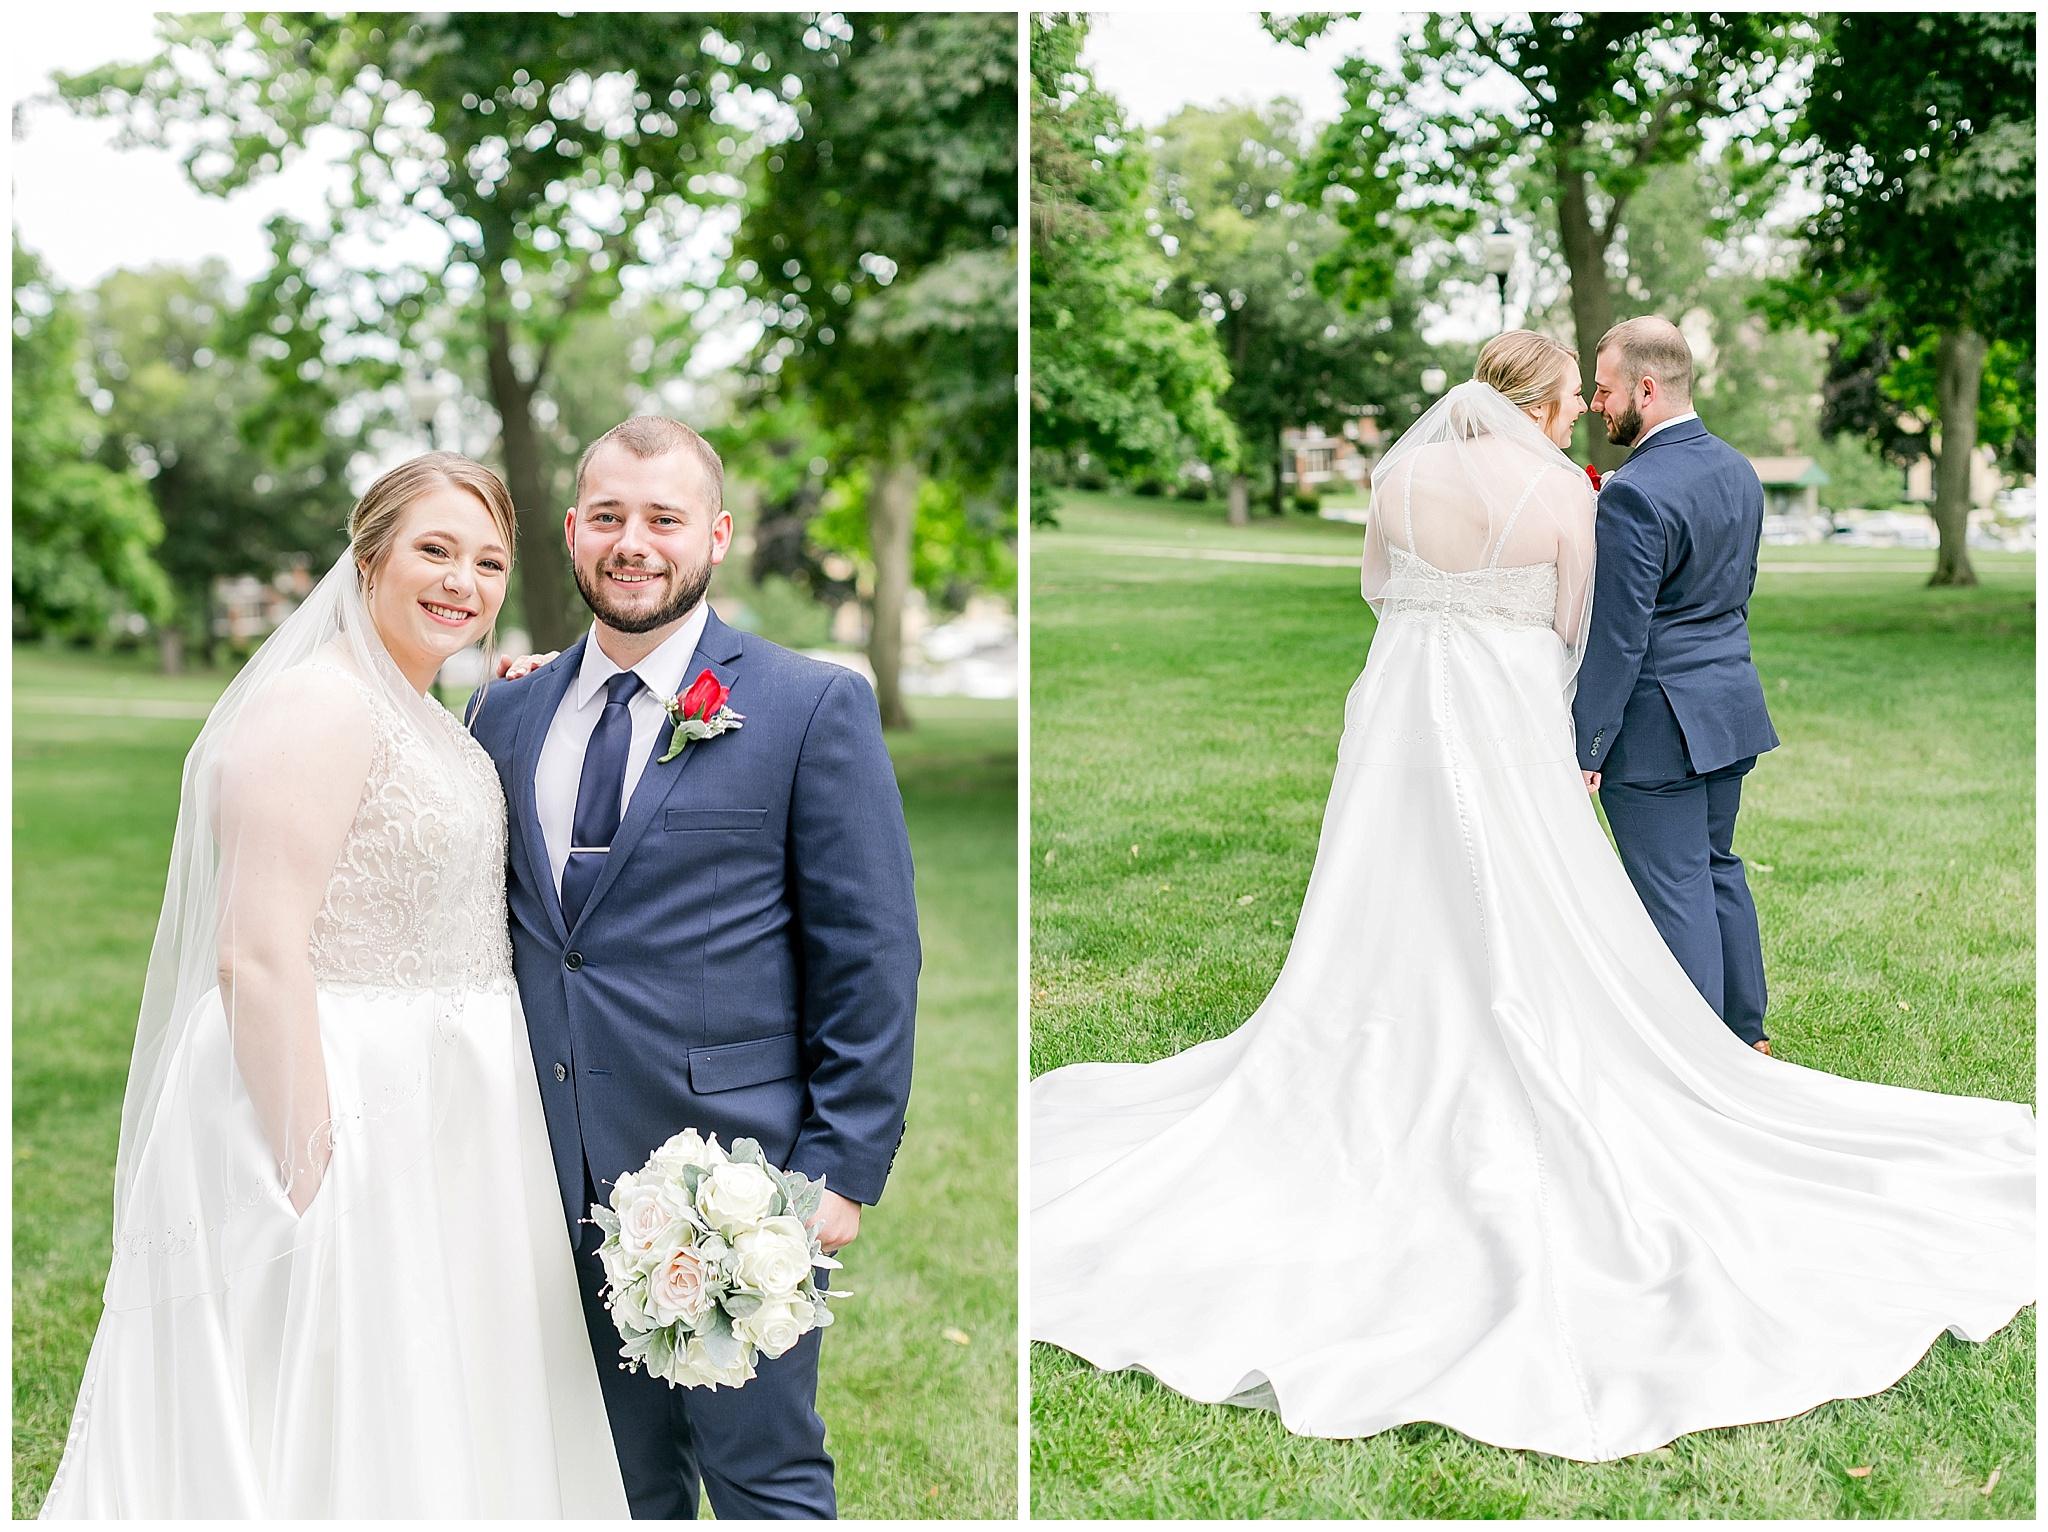 la_casa_grande_wedding_beloit_wisconsin_caynay_photo_0034.jpg